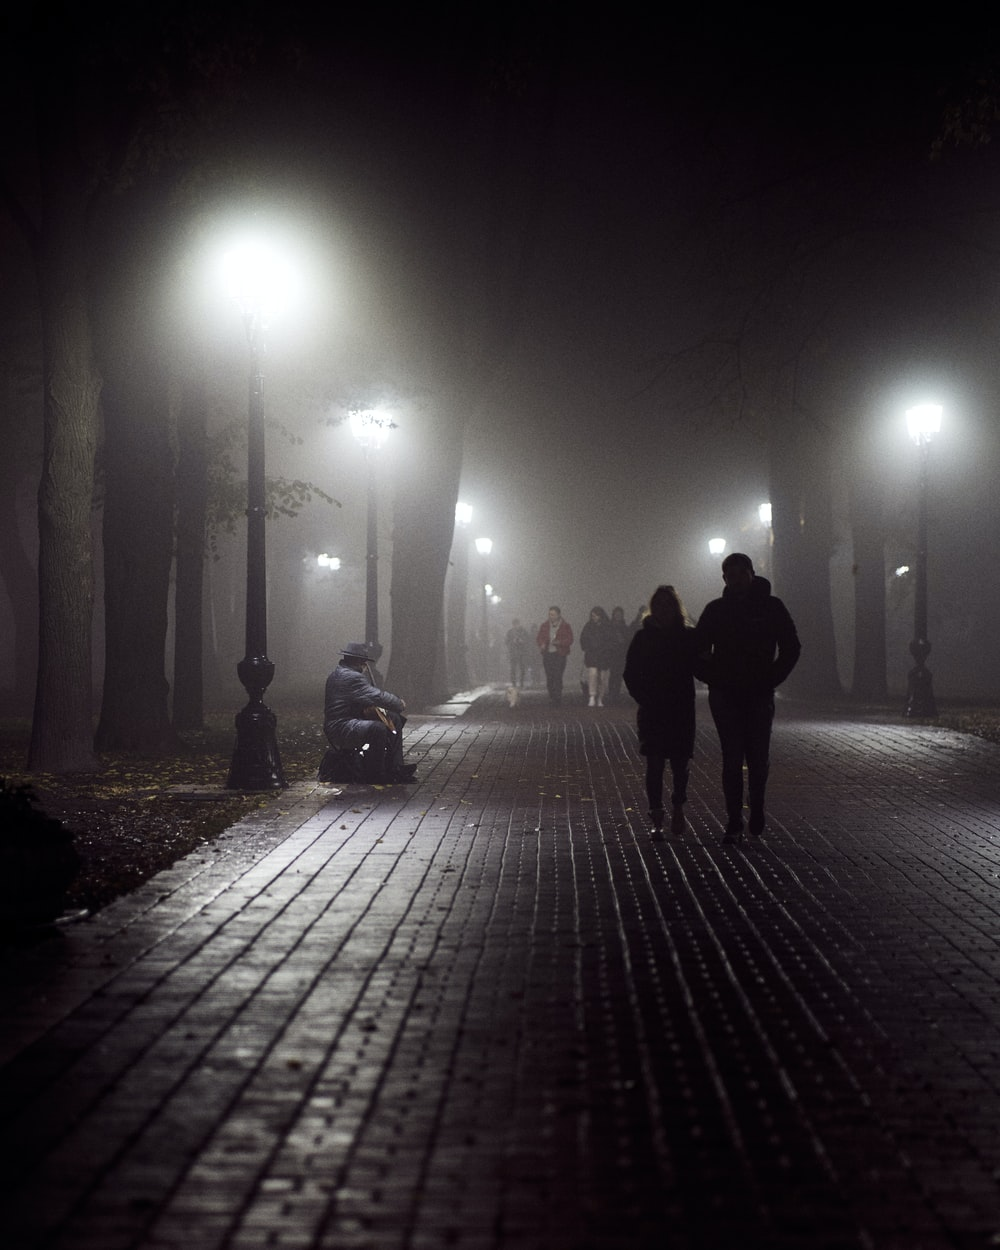 silhouette of 2 people walking on sidewalk during night time